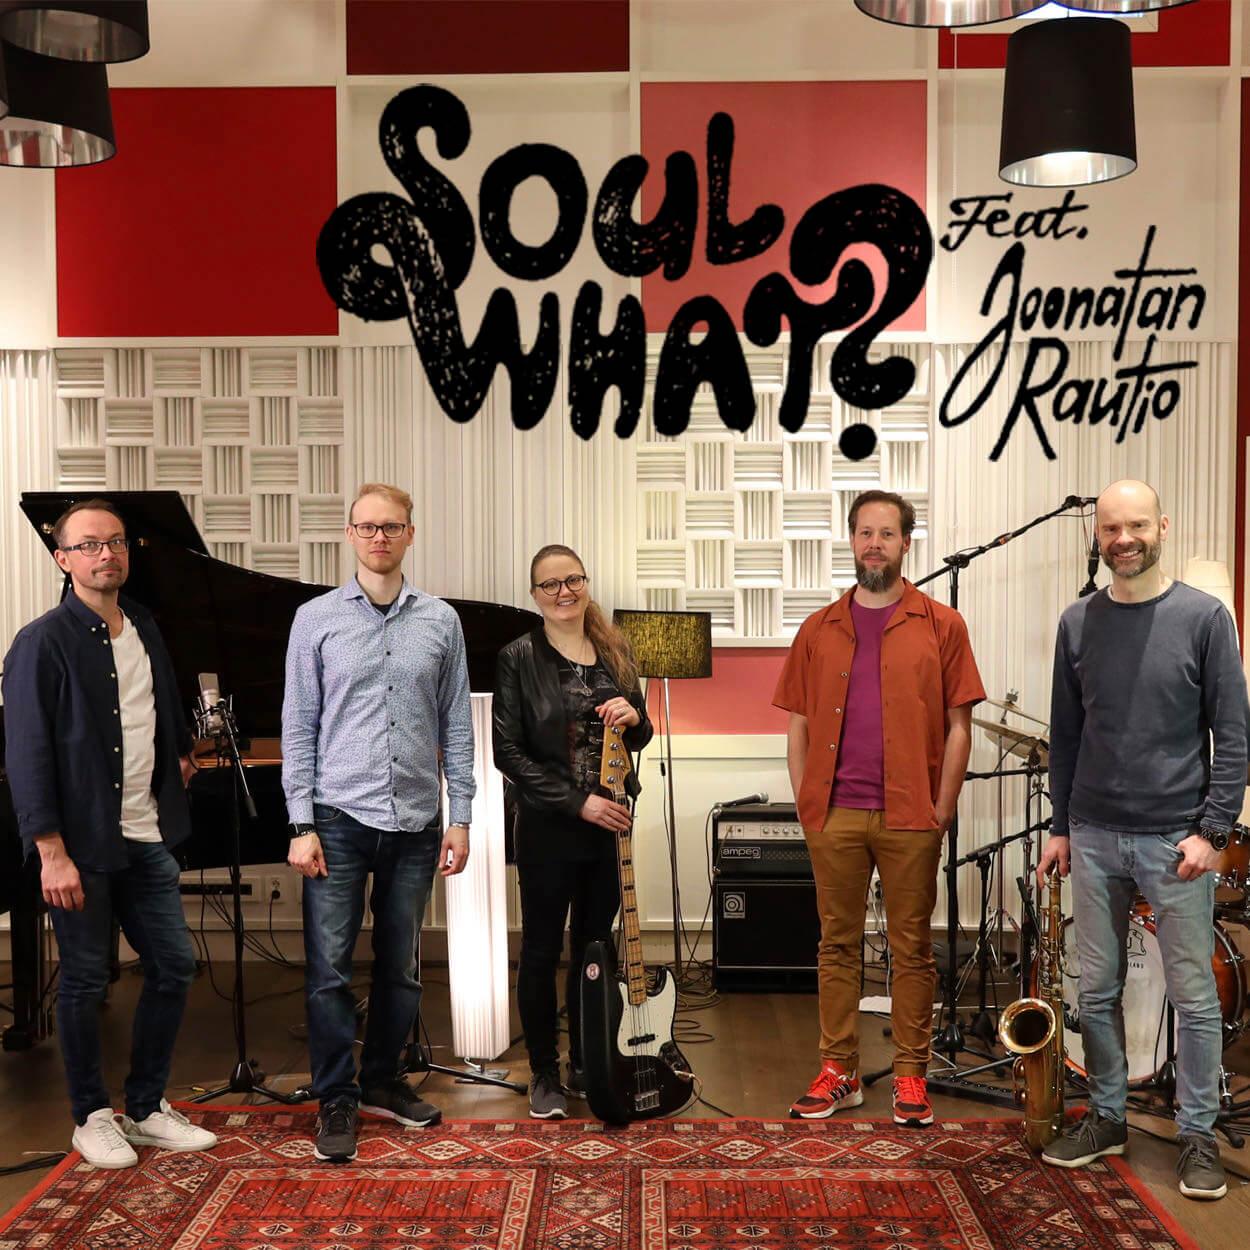 Soul What Joonatan Rautio Mikael Svarvar konsertti konsert concert